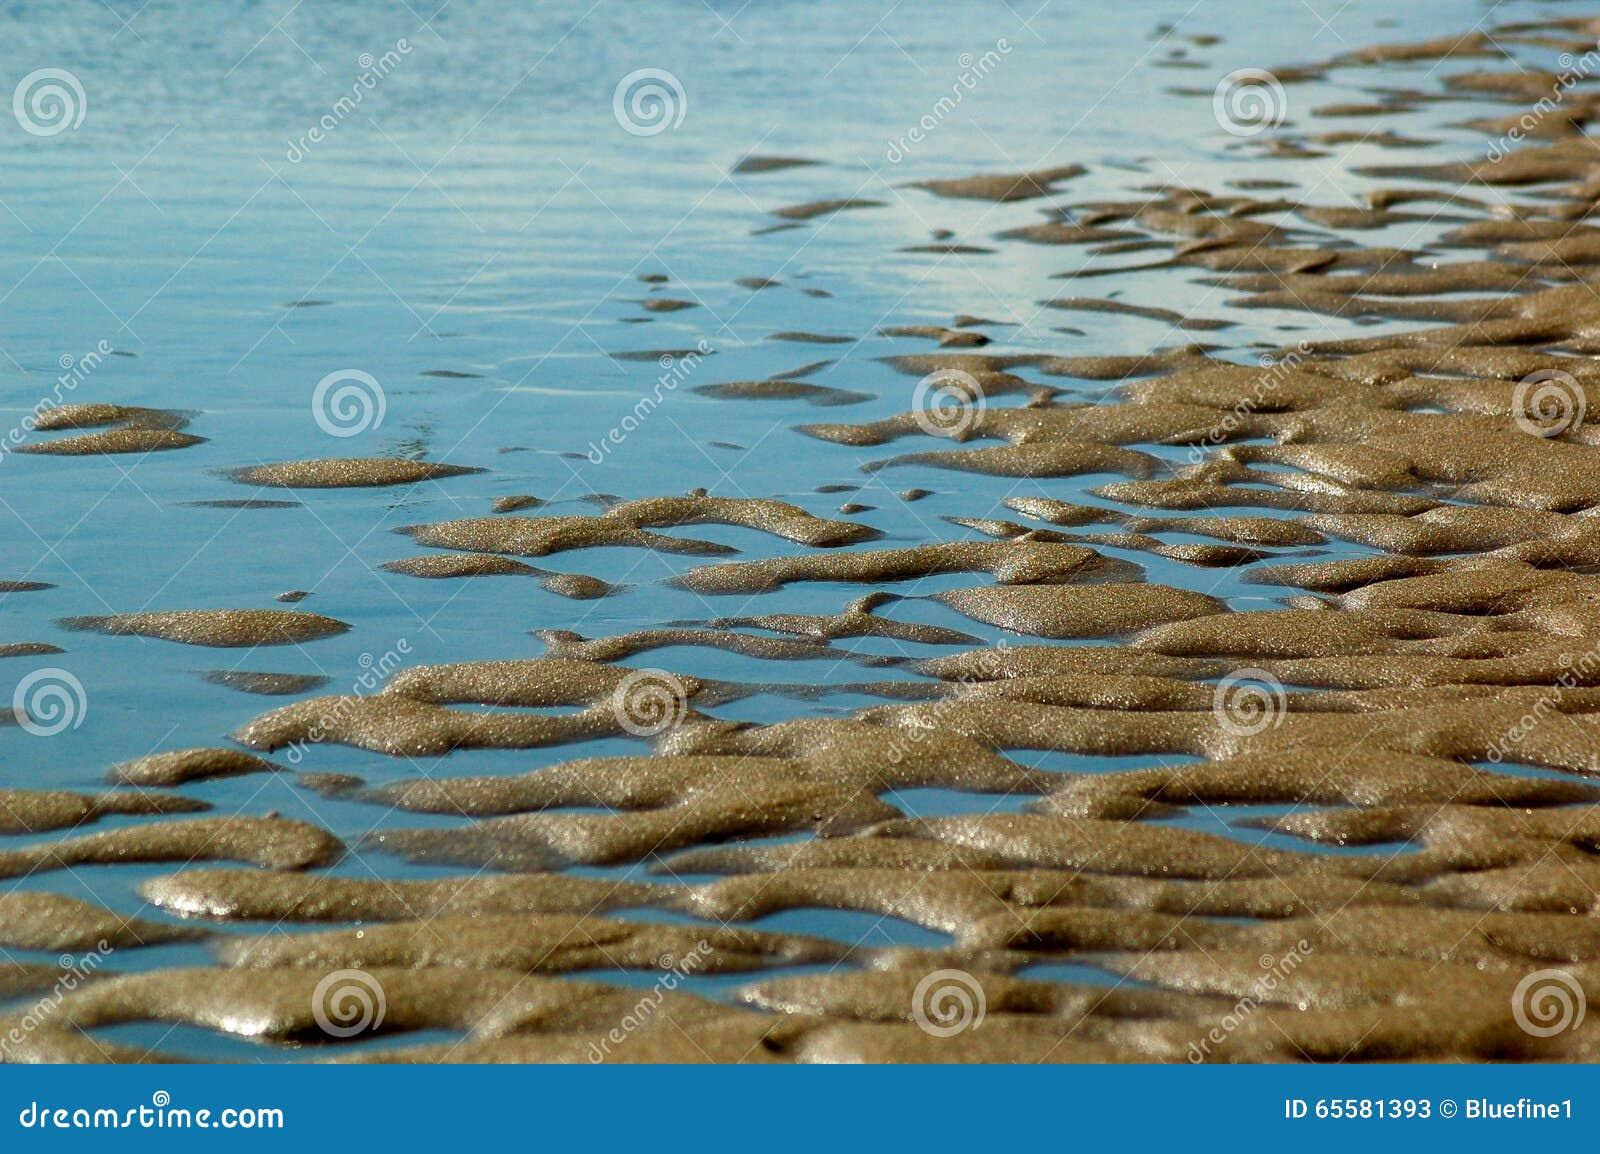 Maré baixa na praia